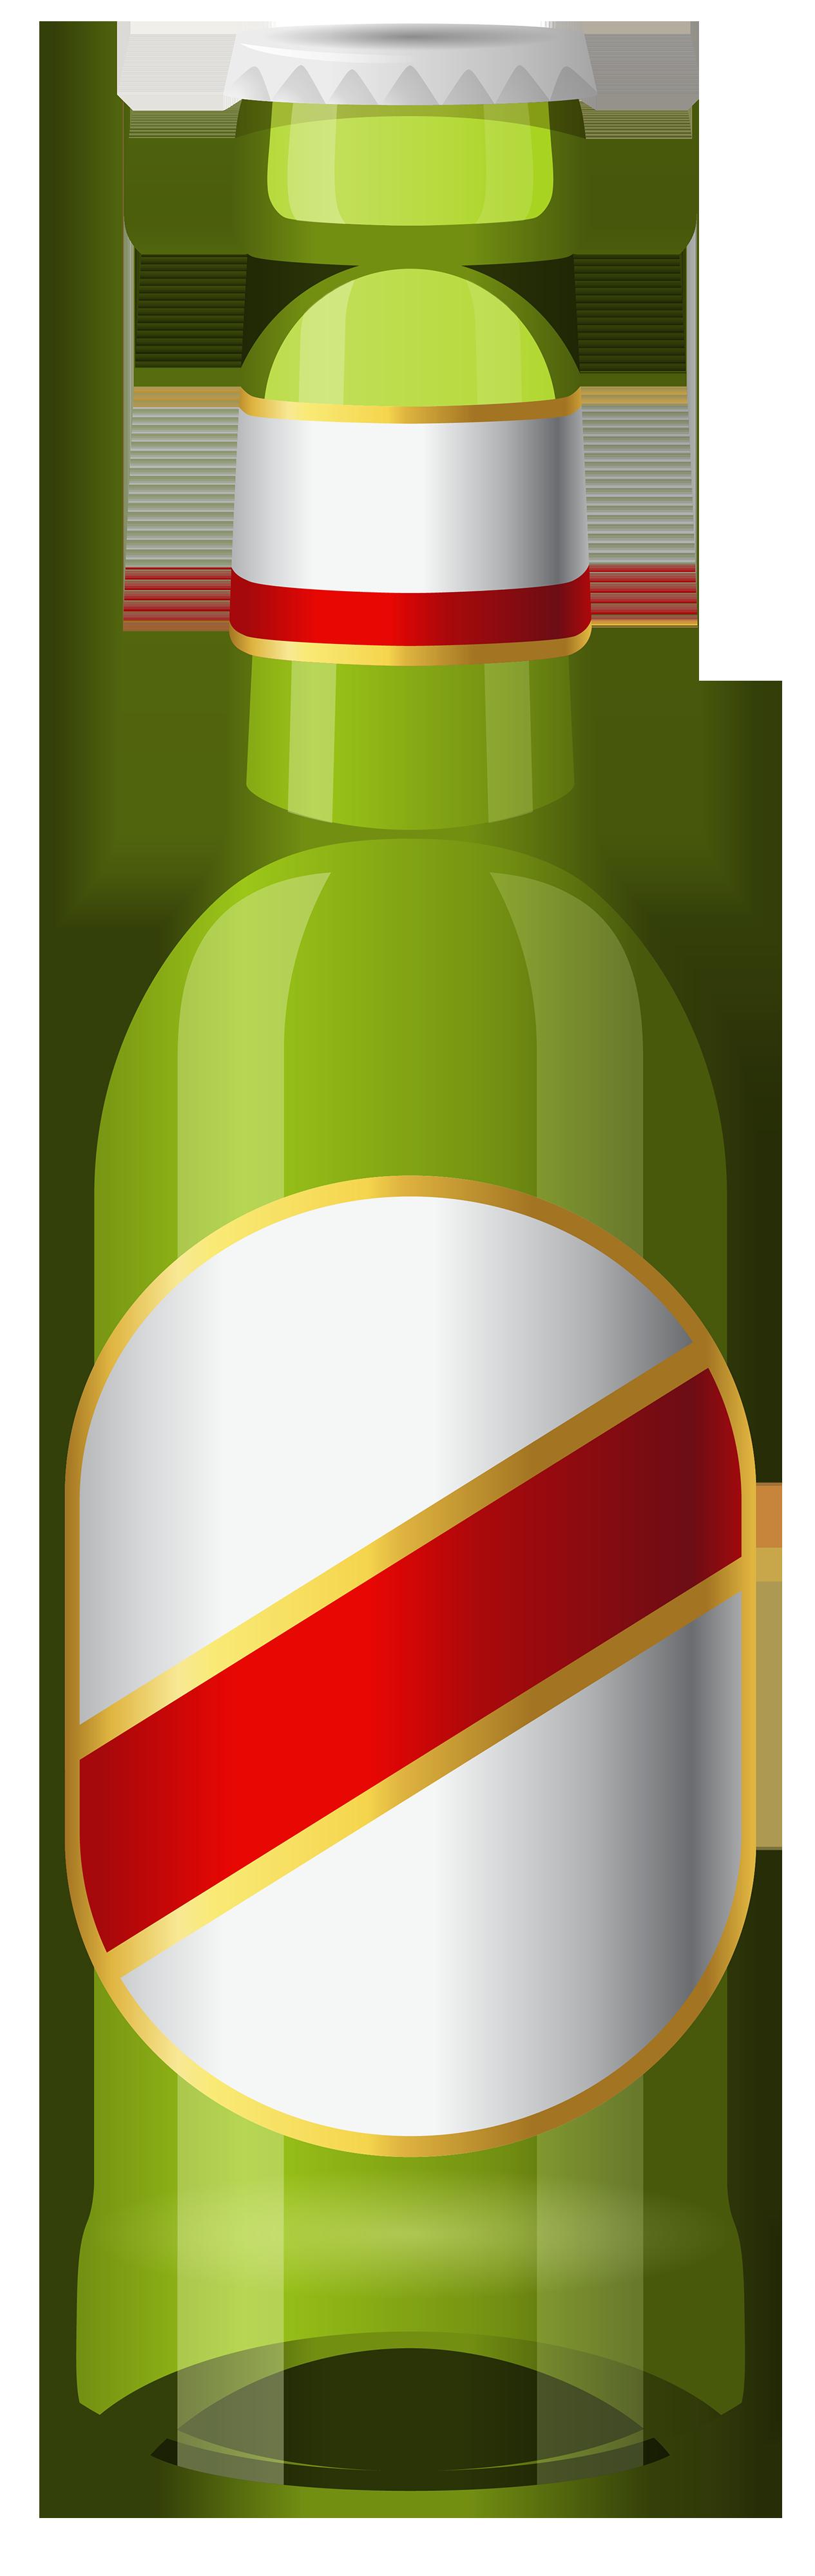 Beer Bottle Art u2014 Crafthubs